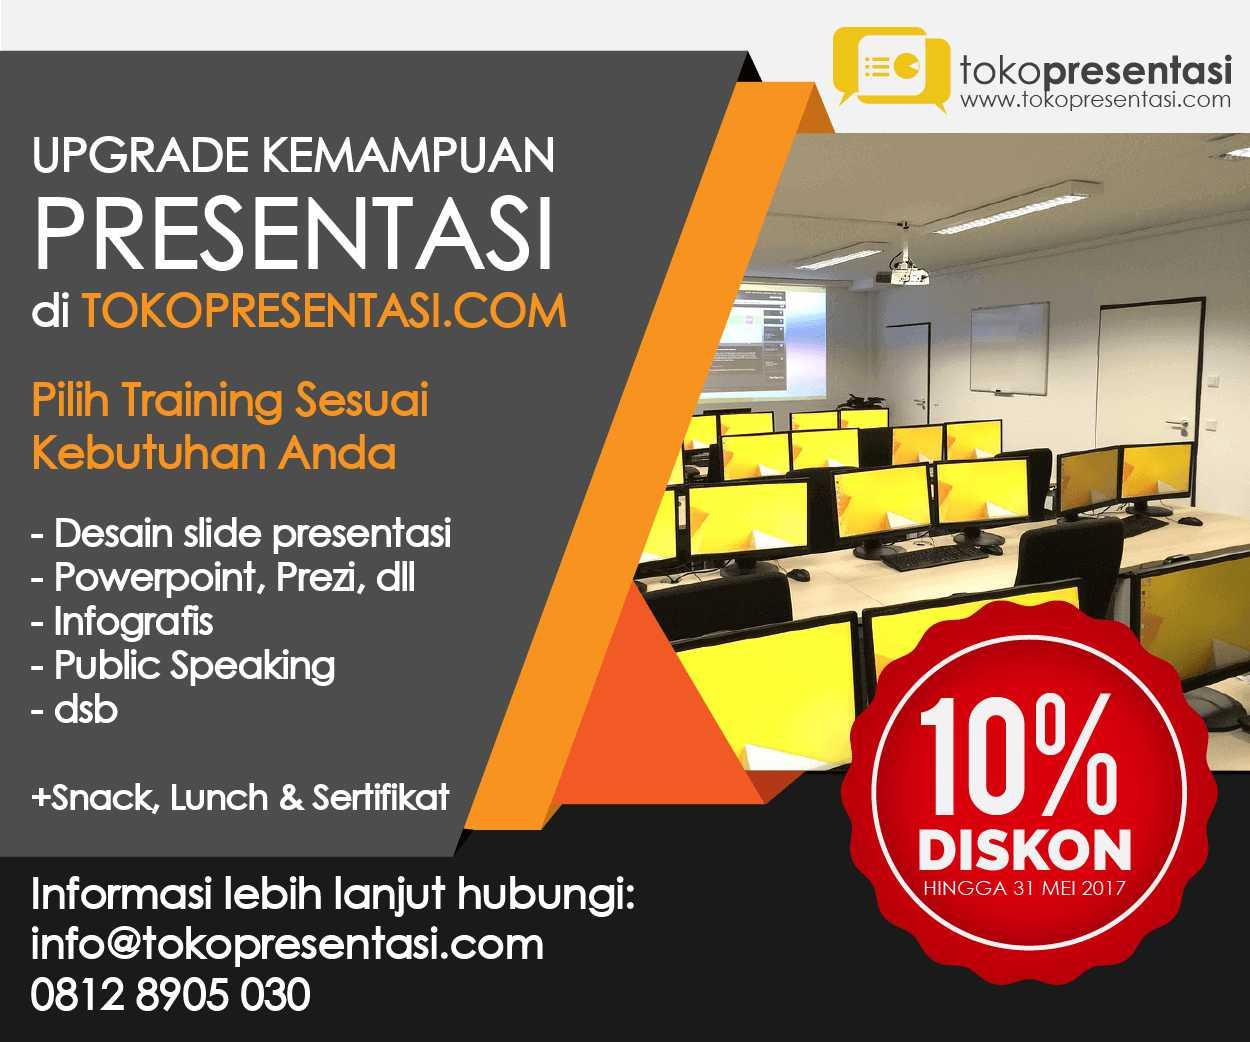 post diskon inhouse training presentasi desain ppt desain presentasi powerpoint